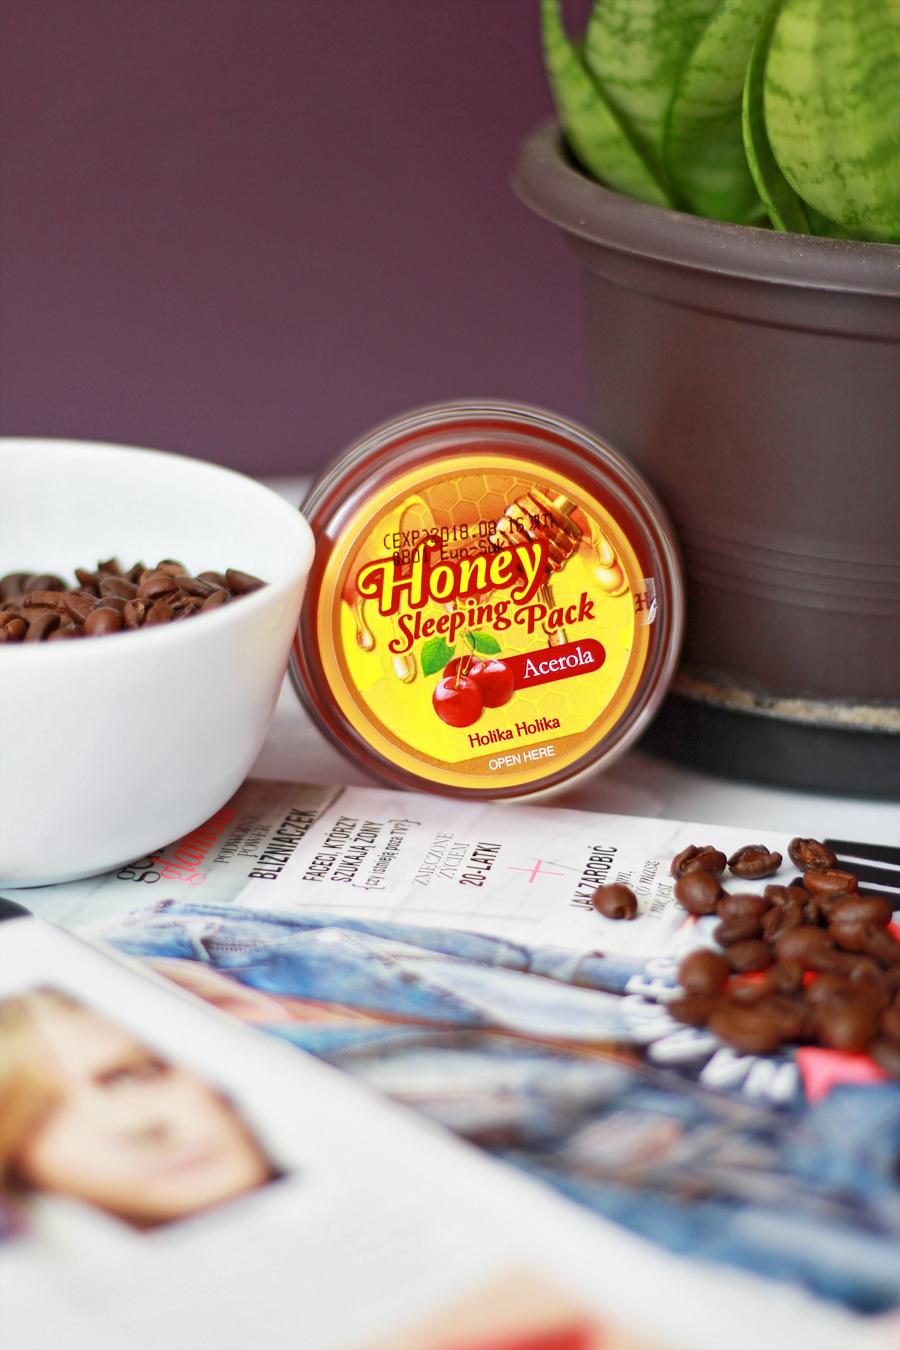 Całonocna, miodowa maseczka | Holika Holika - Honey Sleeping Pack ► Acerola